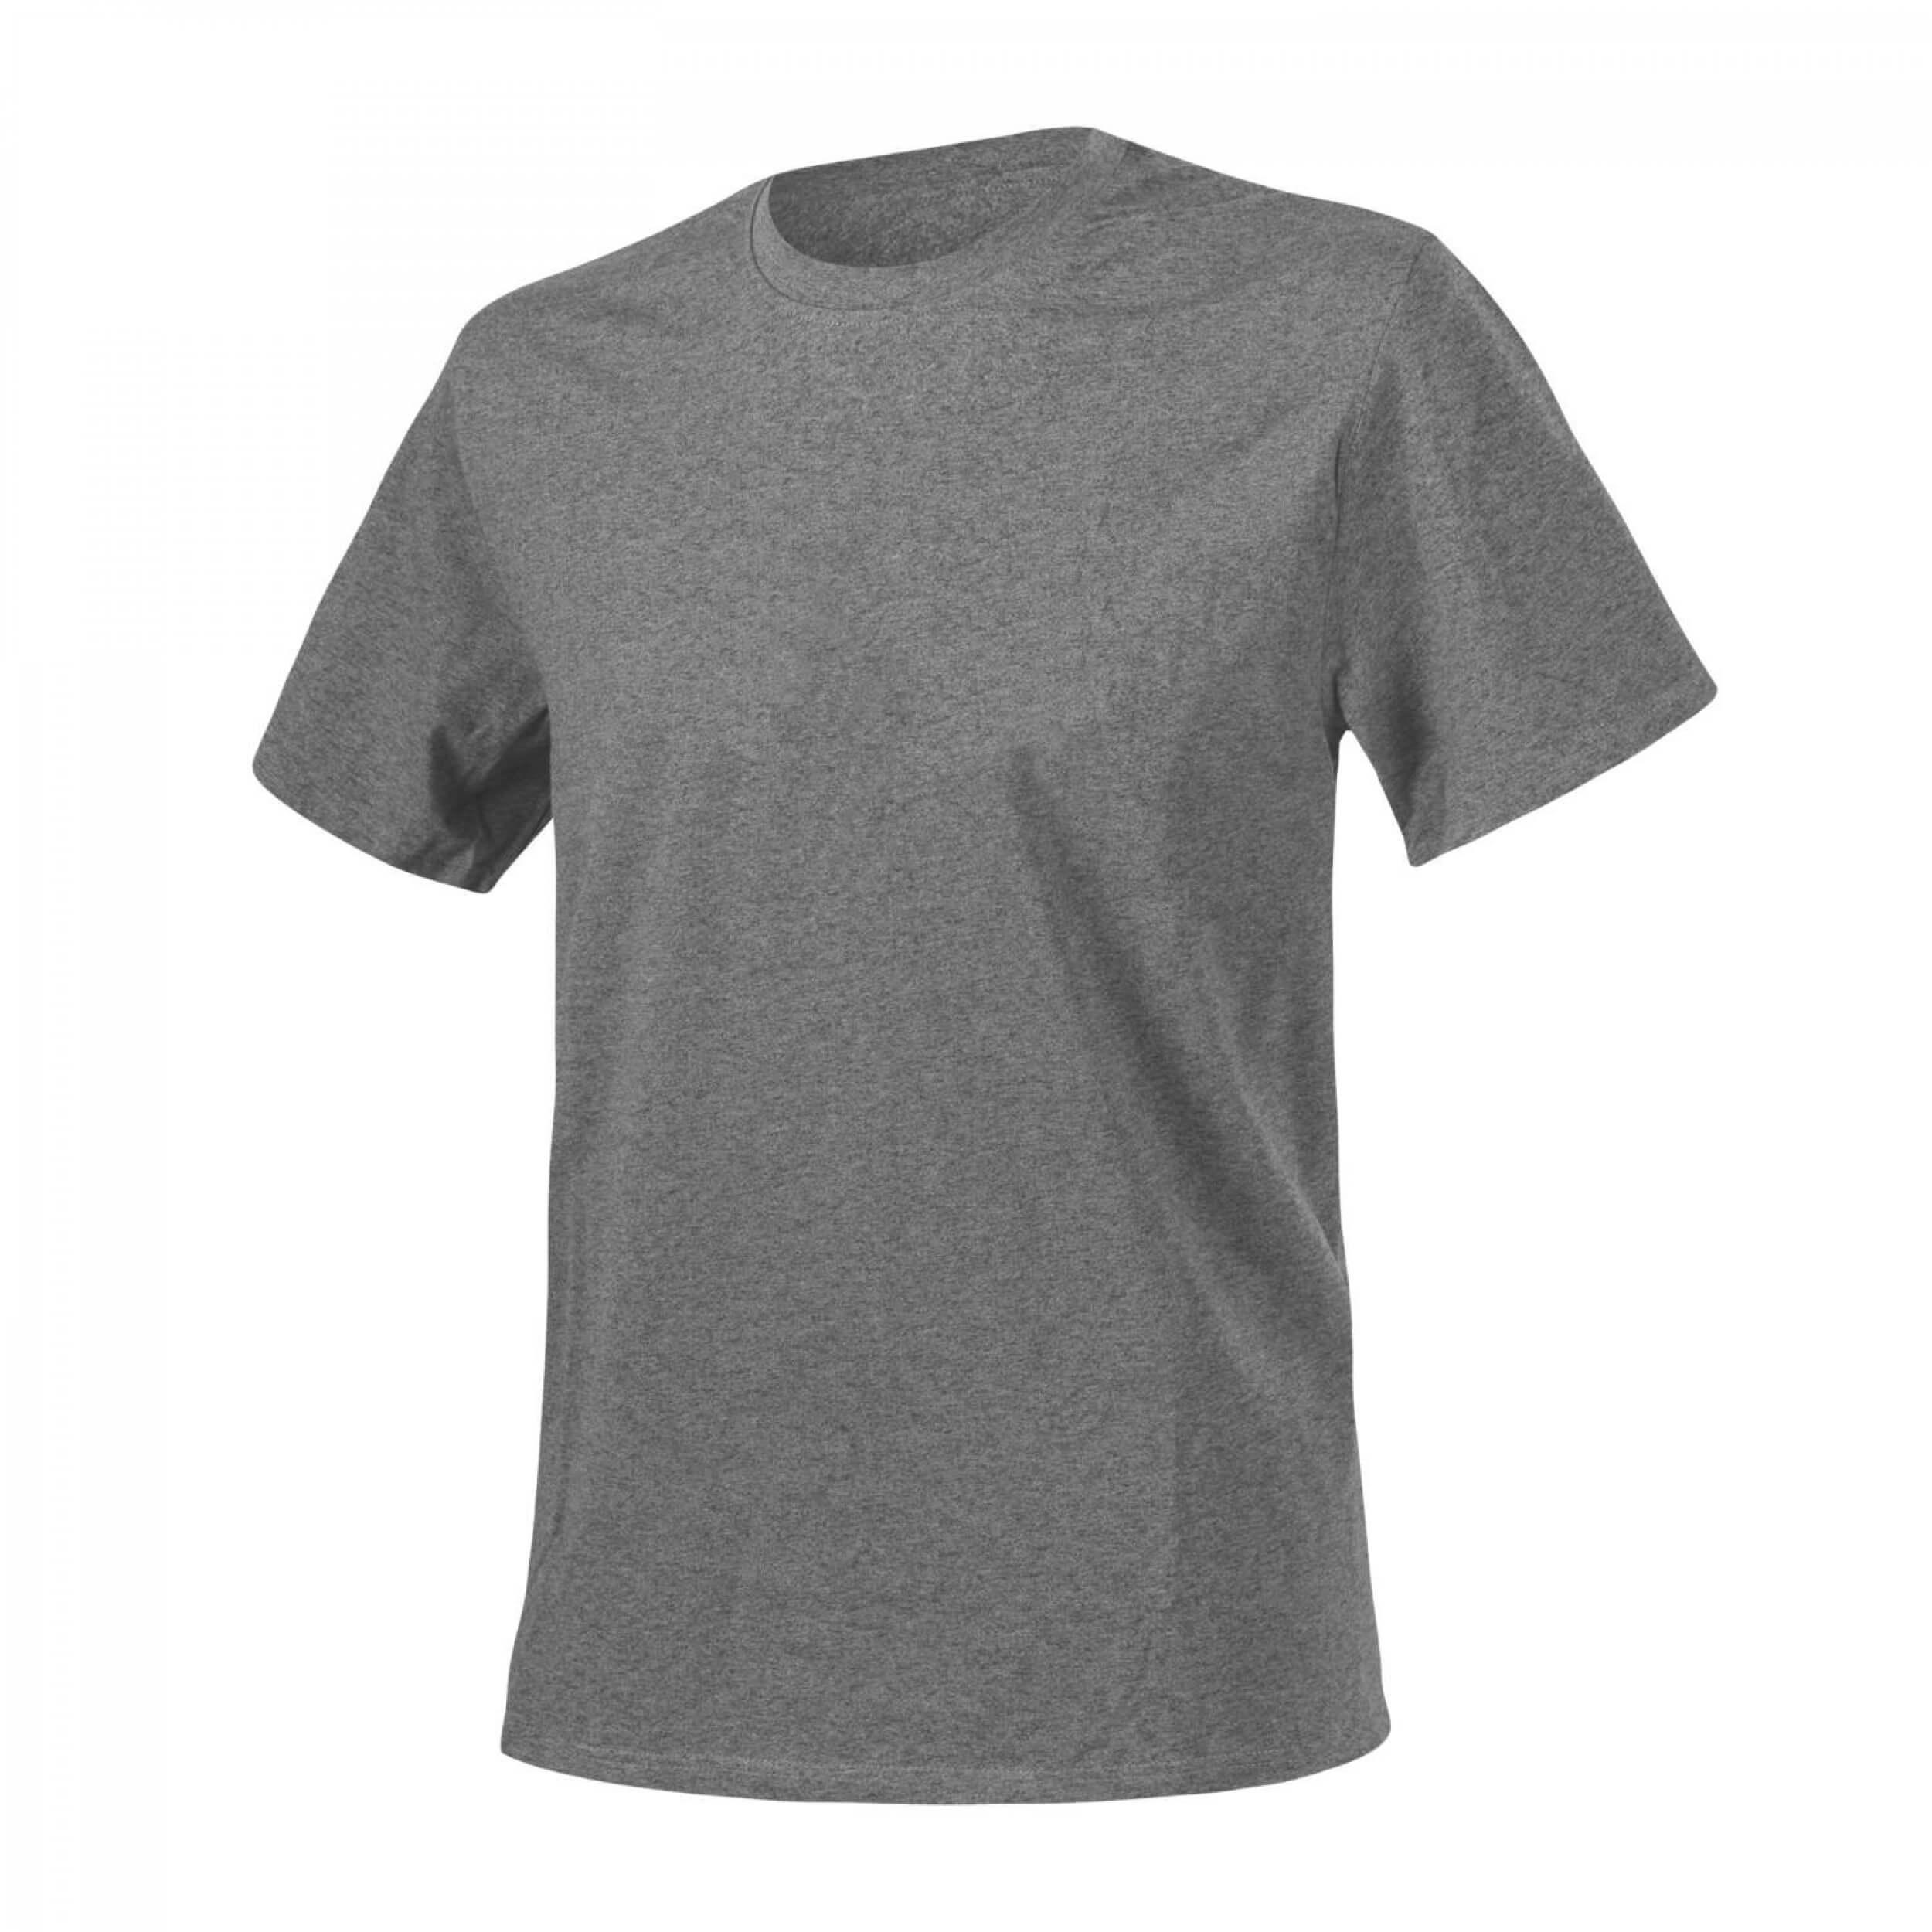 Helikon-Tex Classic T-Shirt - Melange Grey